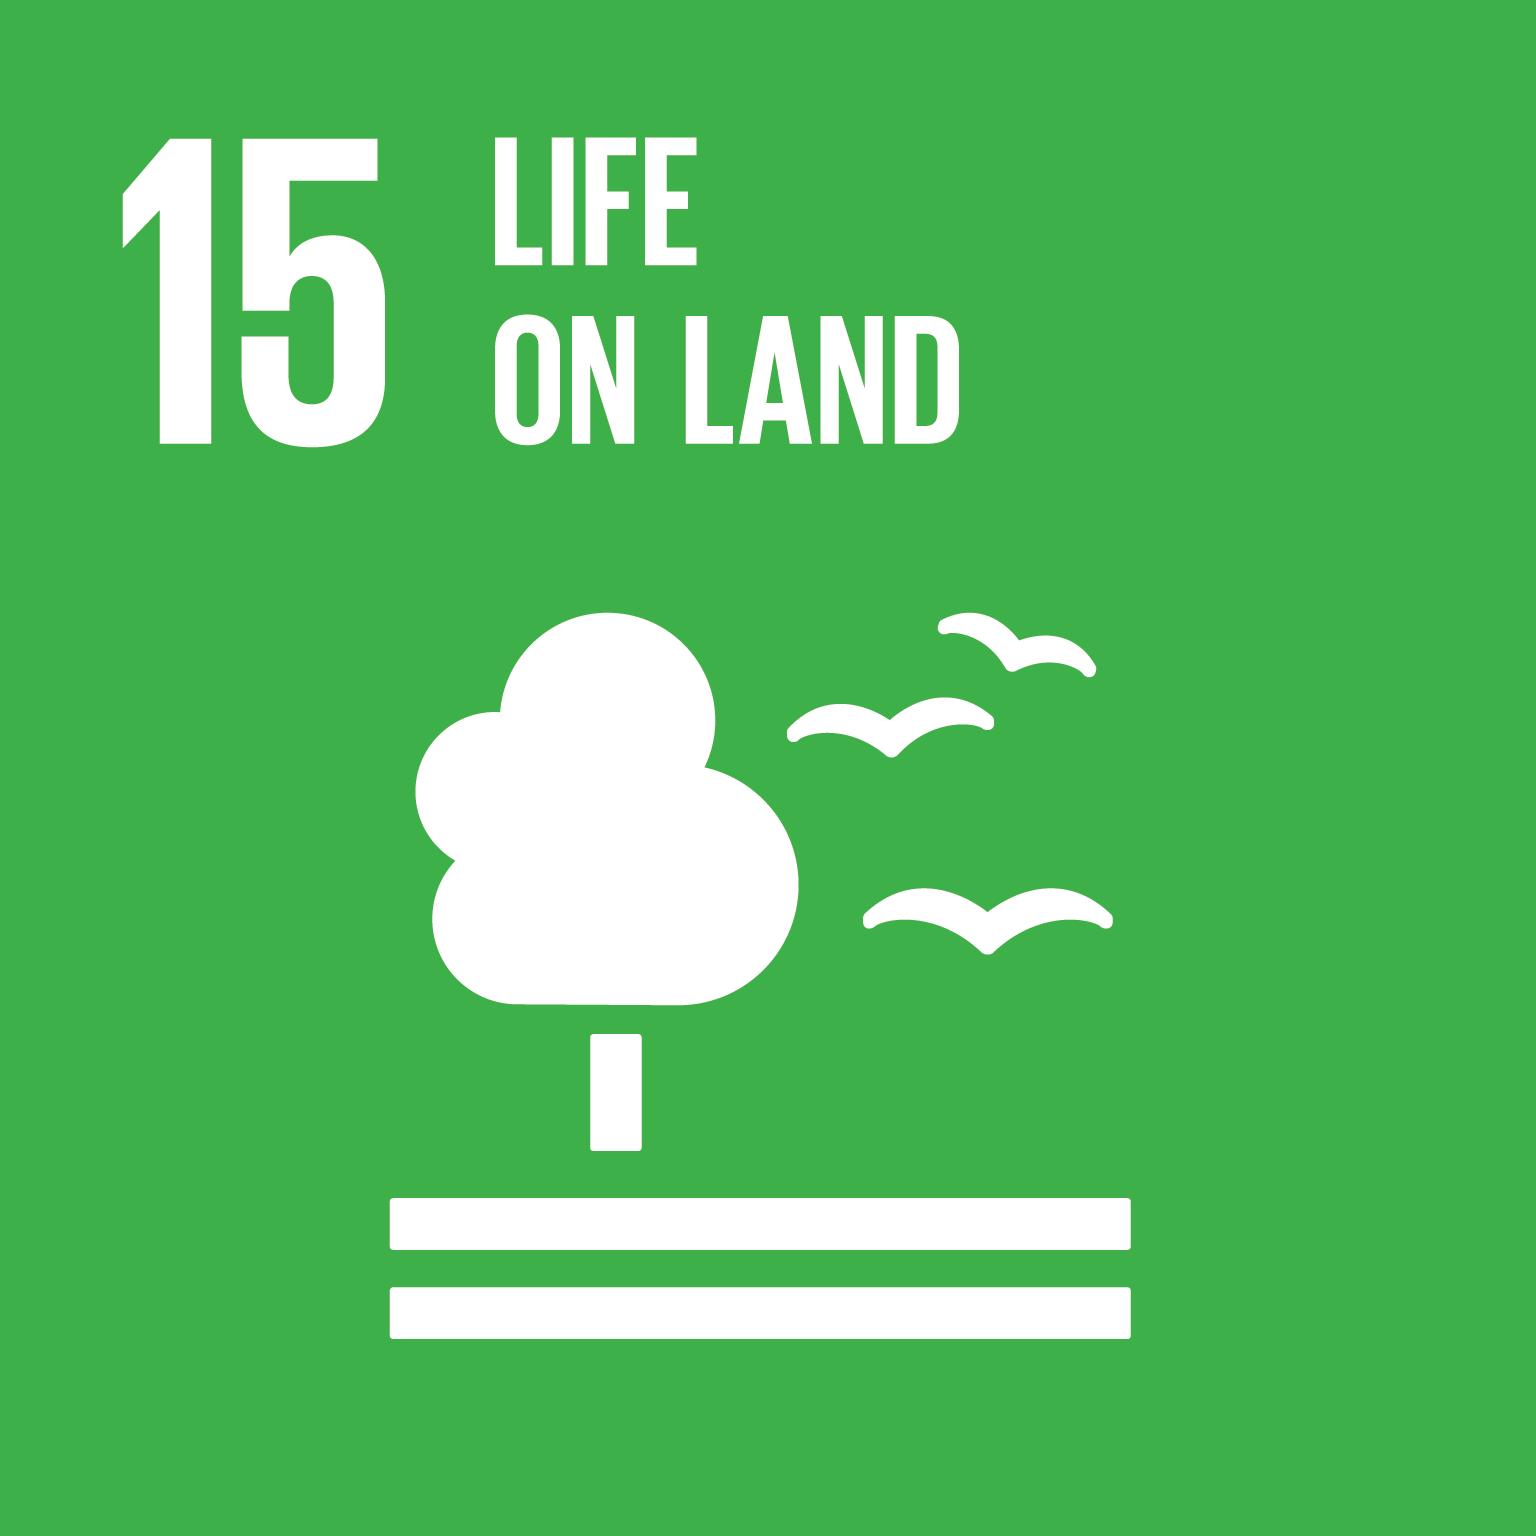 15. Life on Land